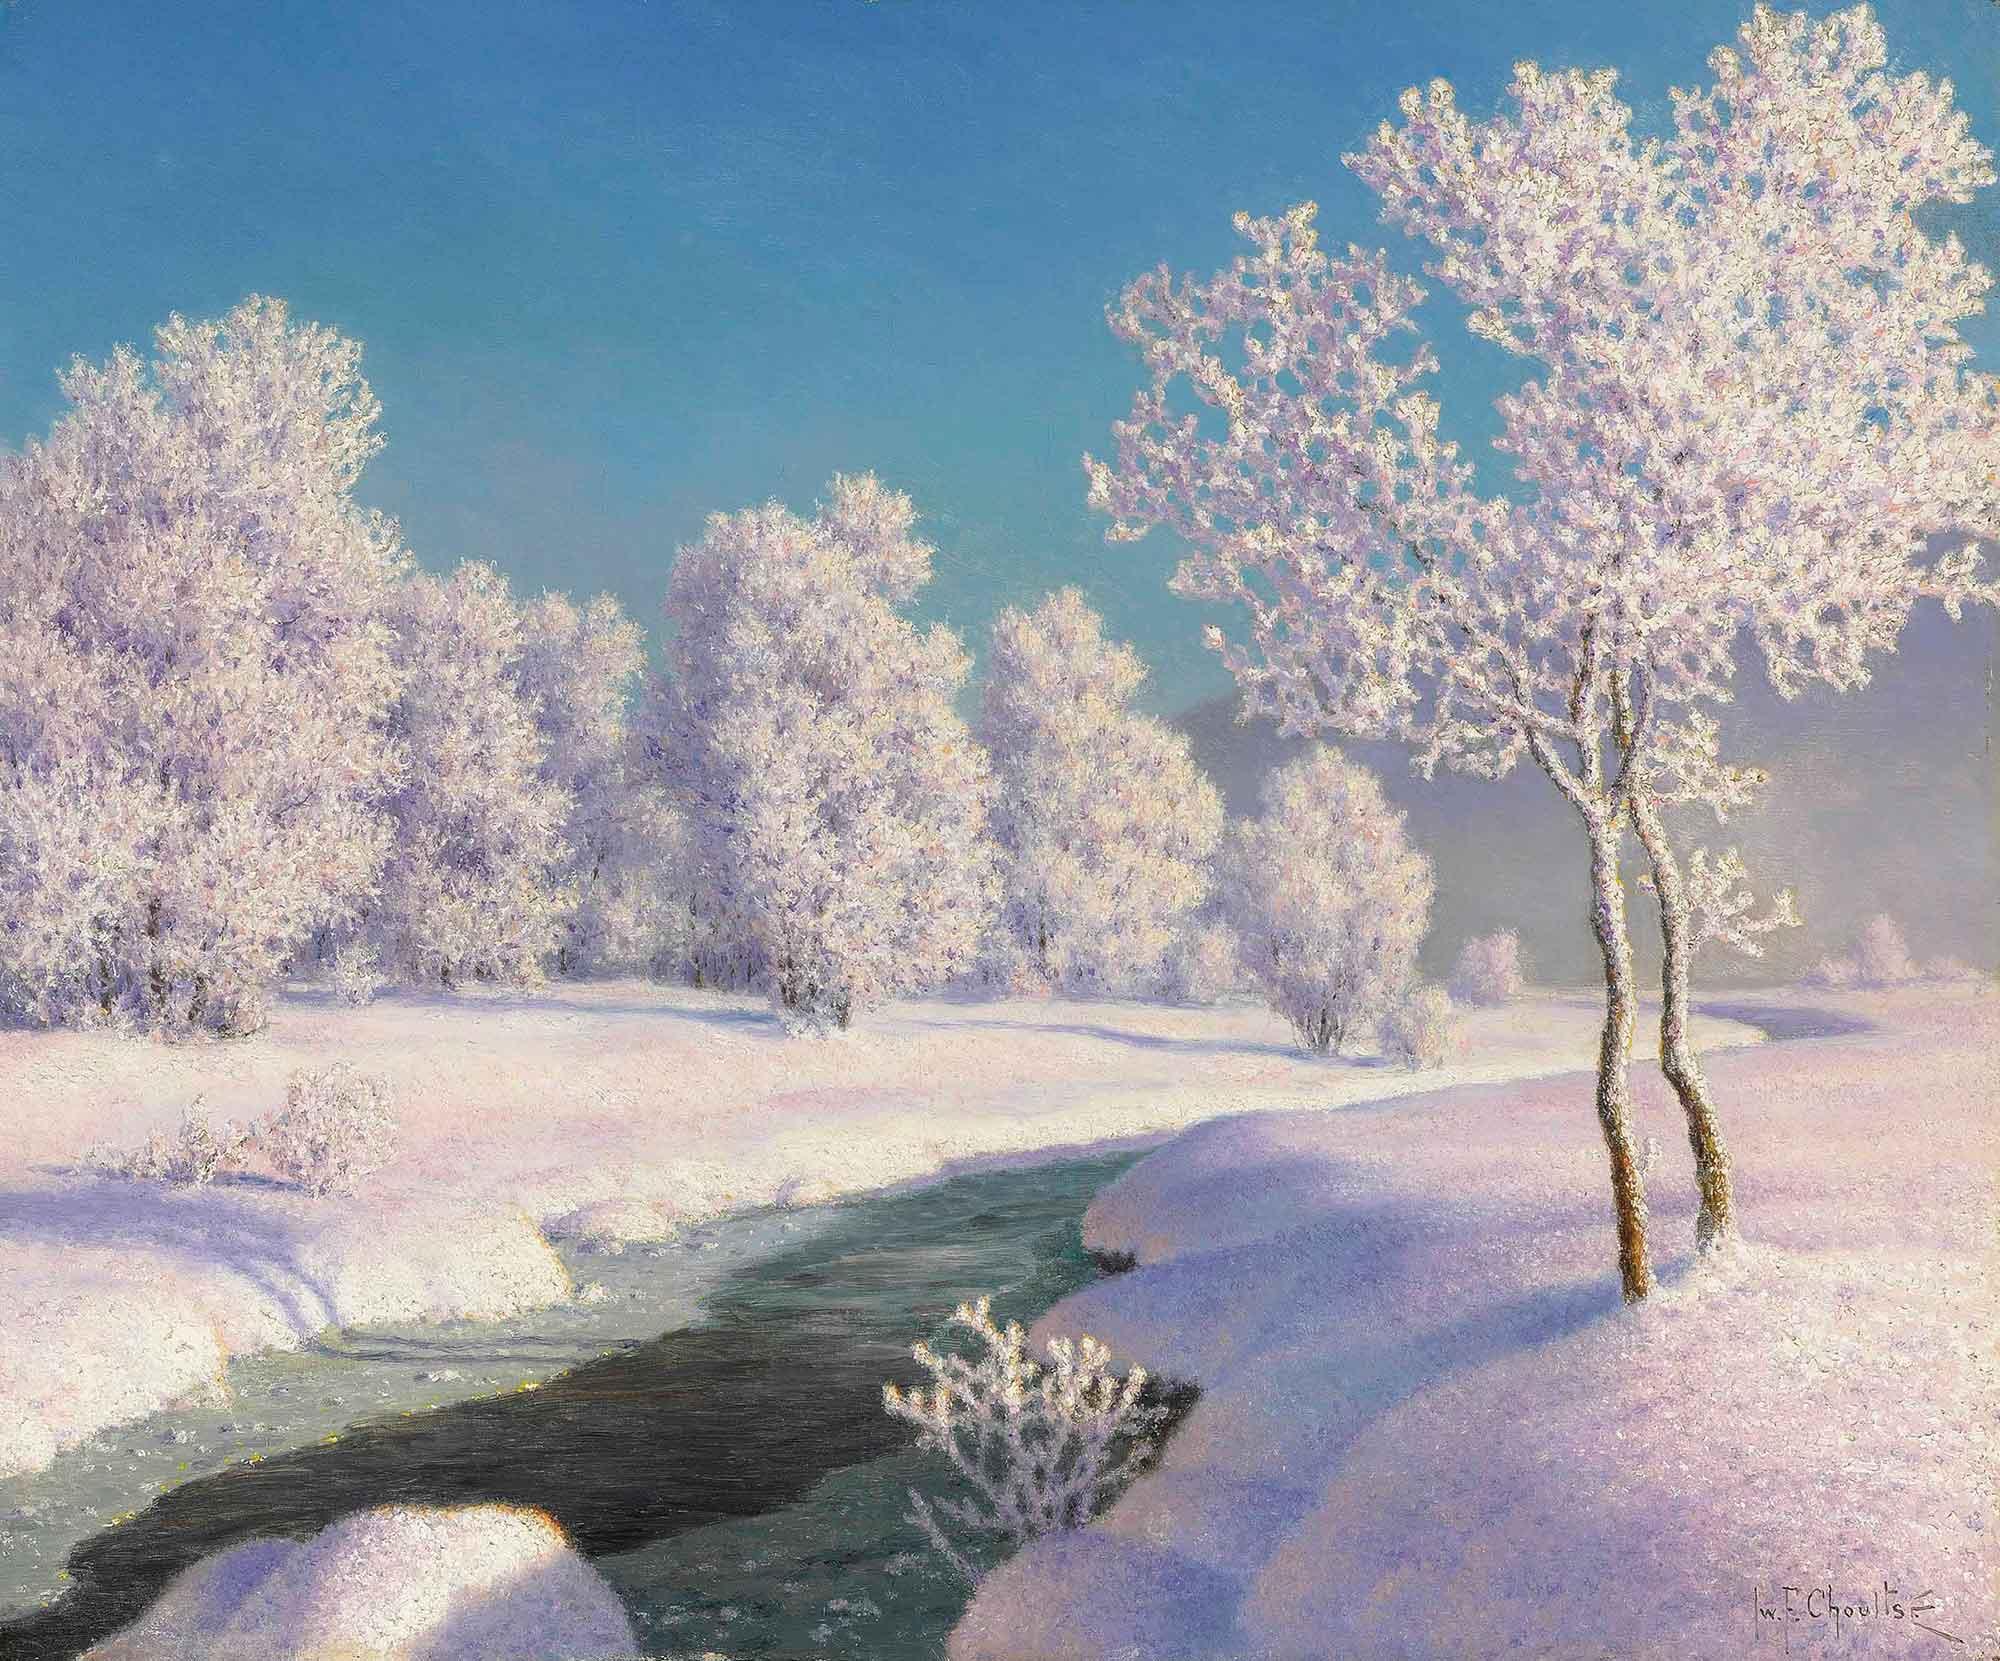 Ivan Fedorovich Choultse Engadin'de Kış Sabahı